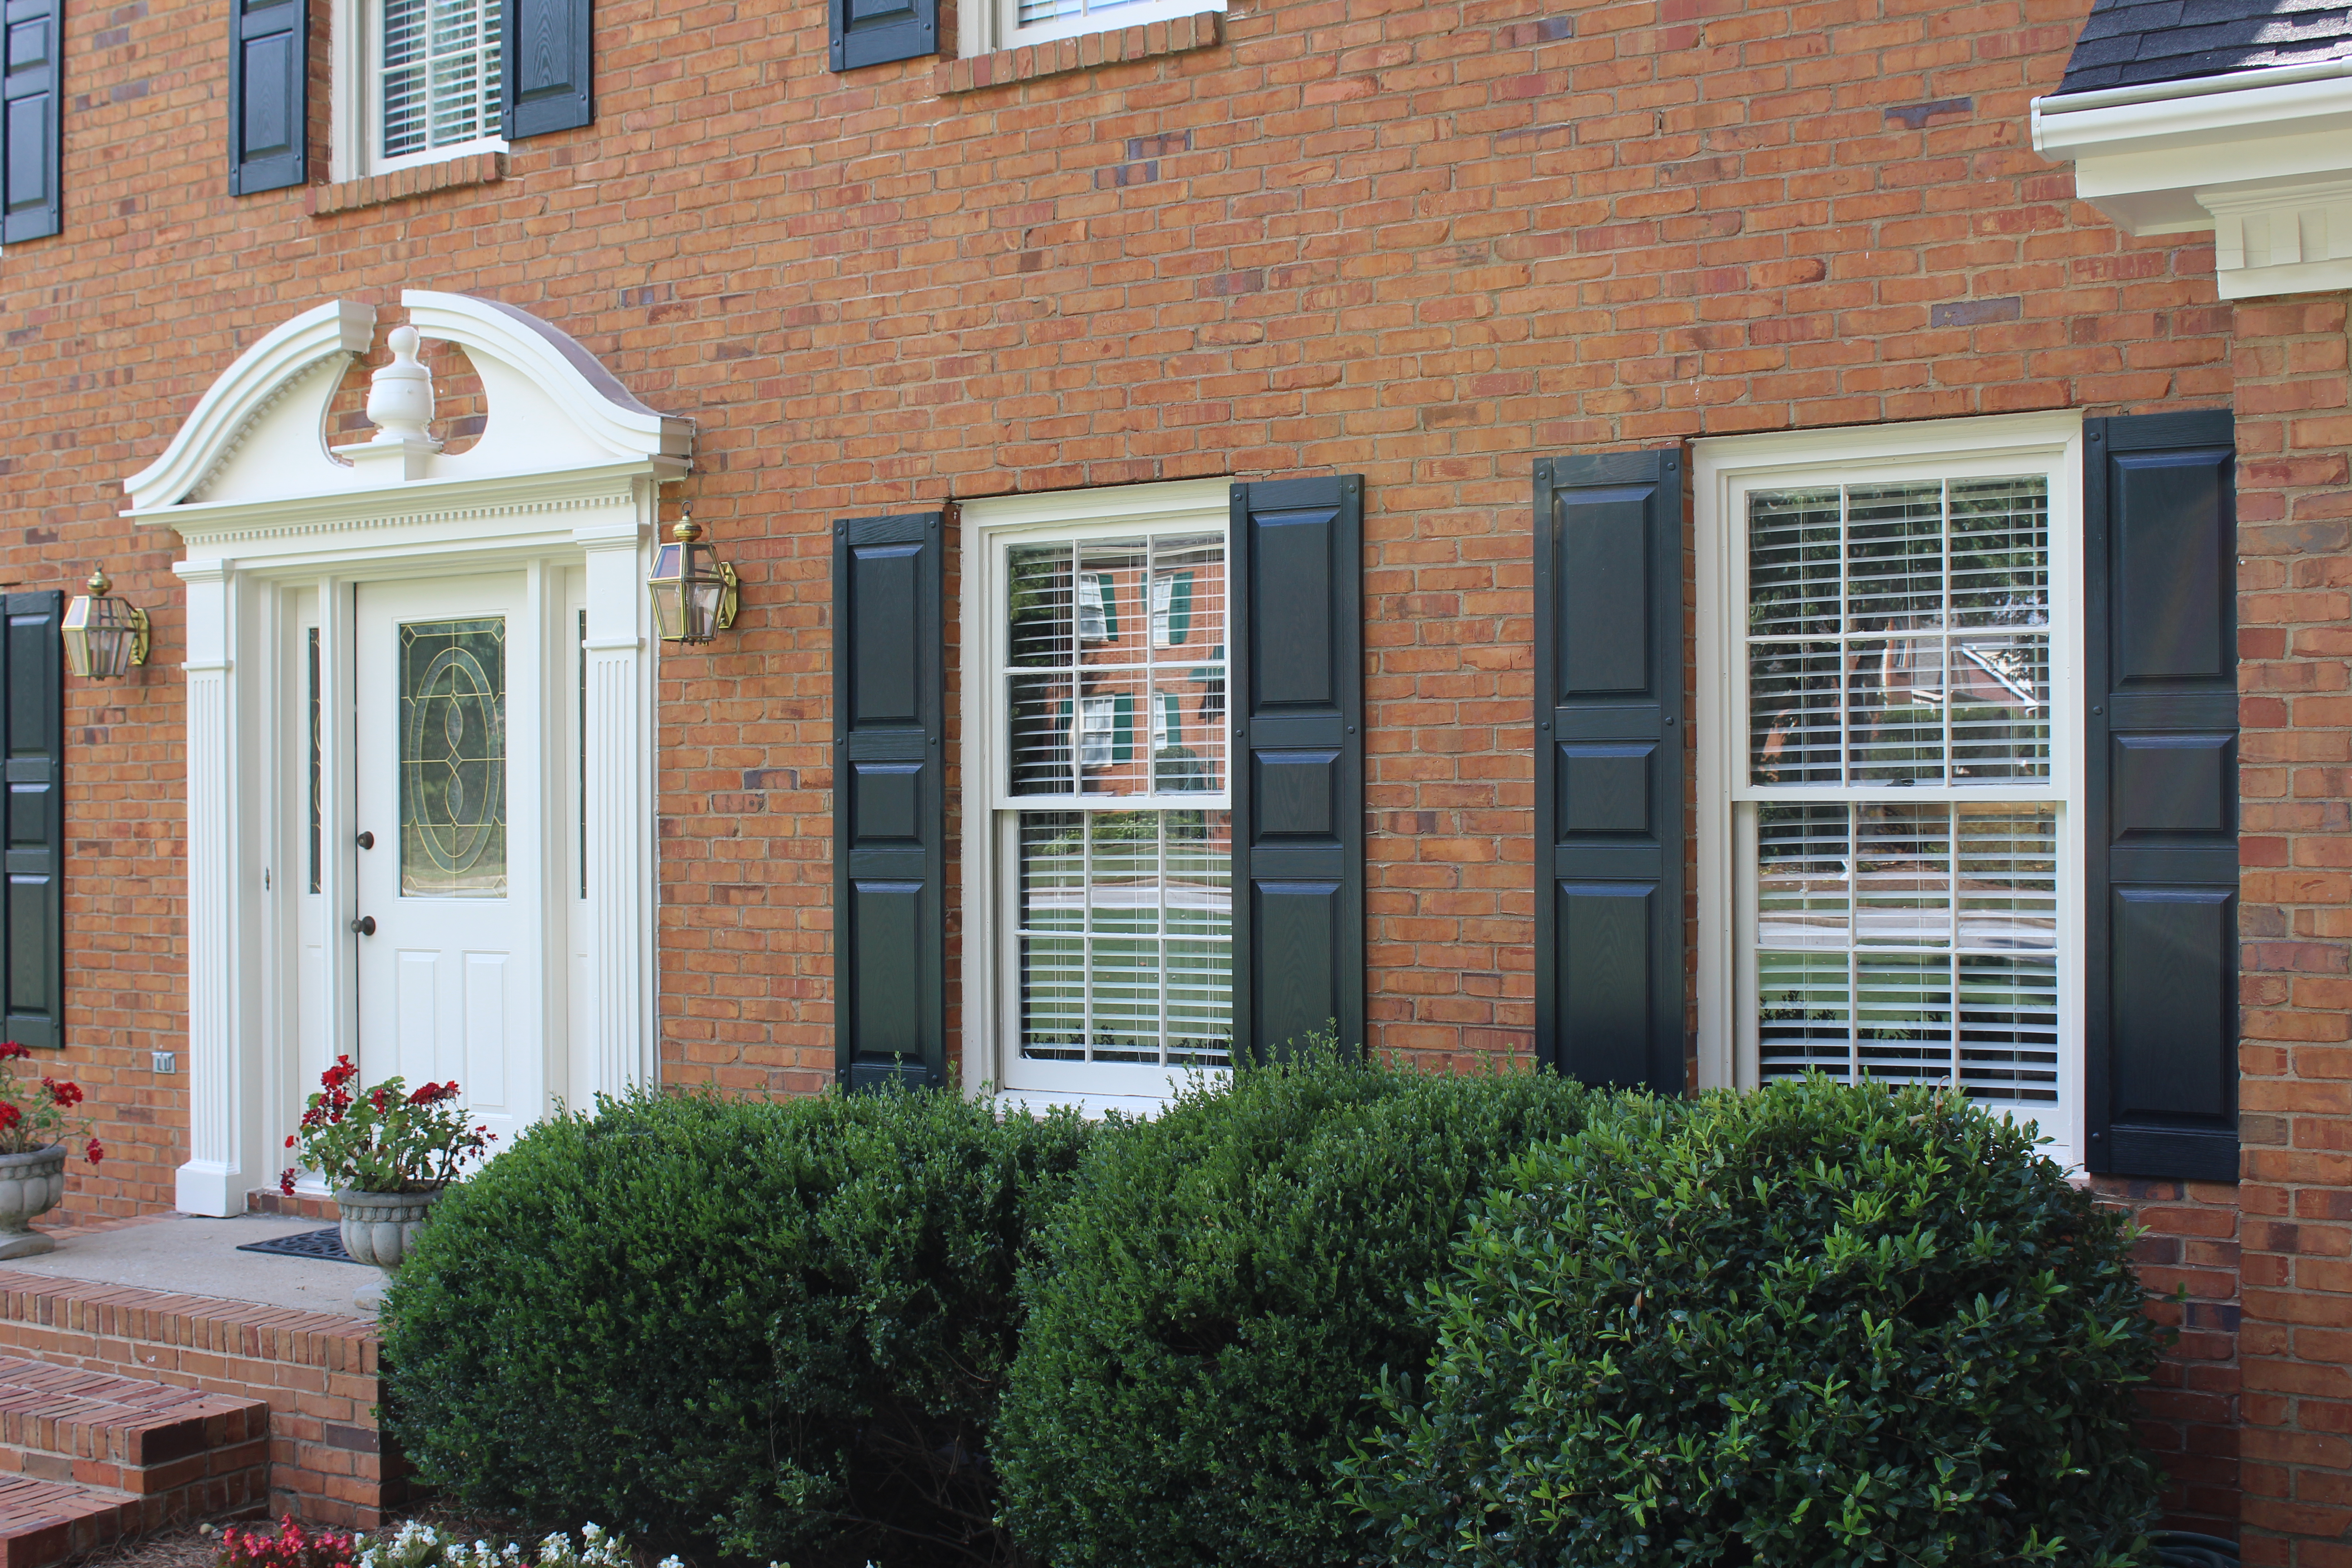 Three Panel Window Shutters Project